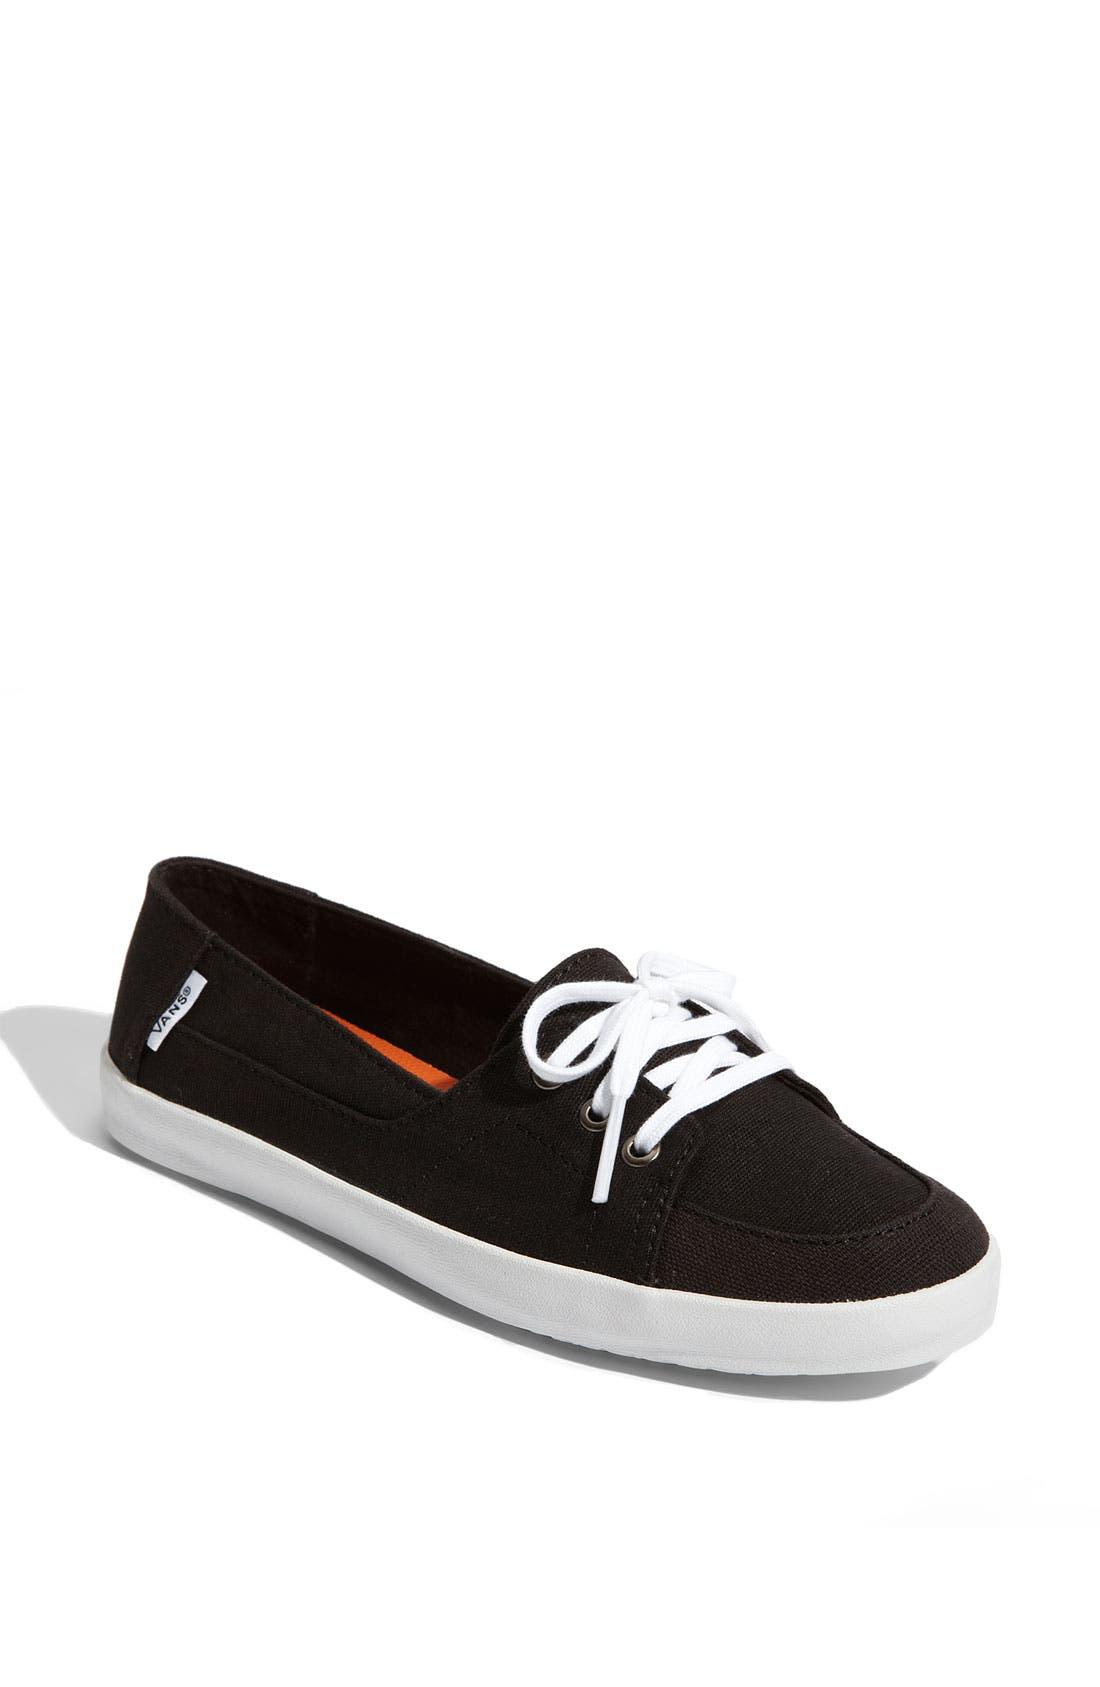 Main Image - Vans 'Palisades' Sneaker (Women)